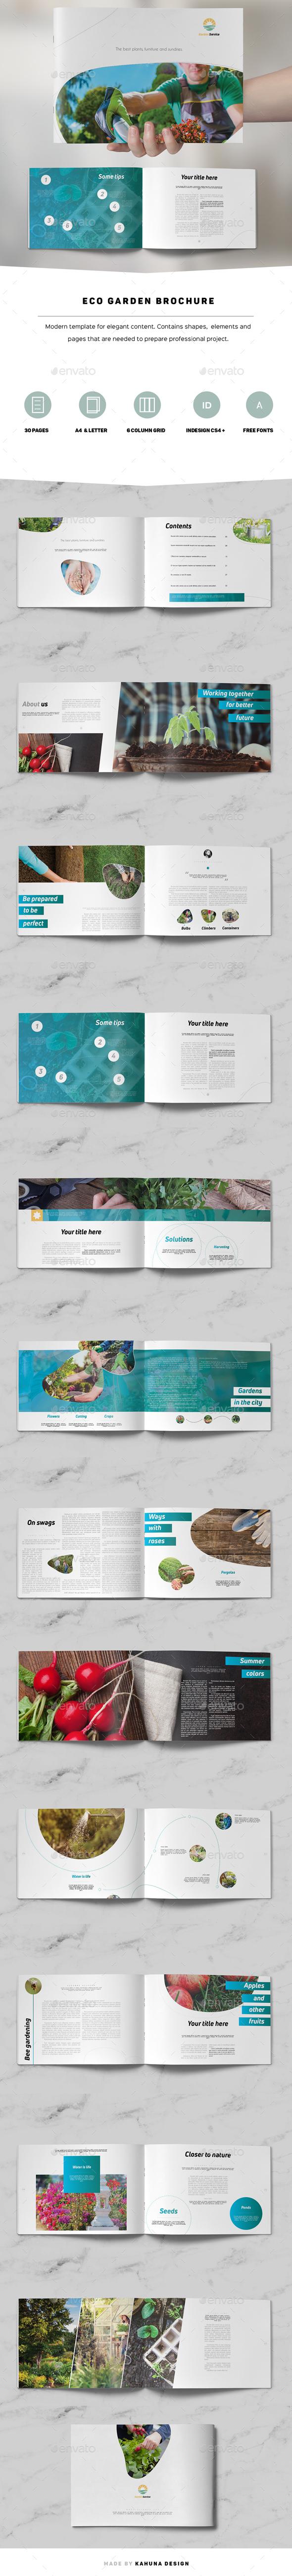 GraphicRiver Eco Garden Brochure Landscape 20958849